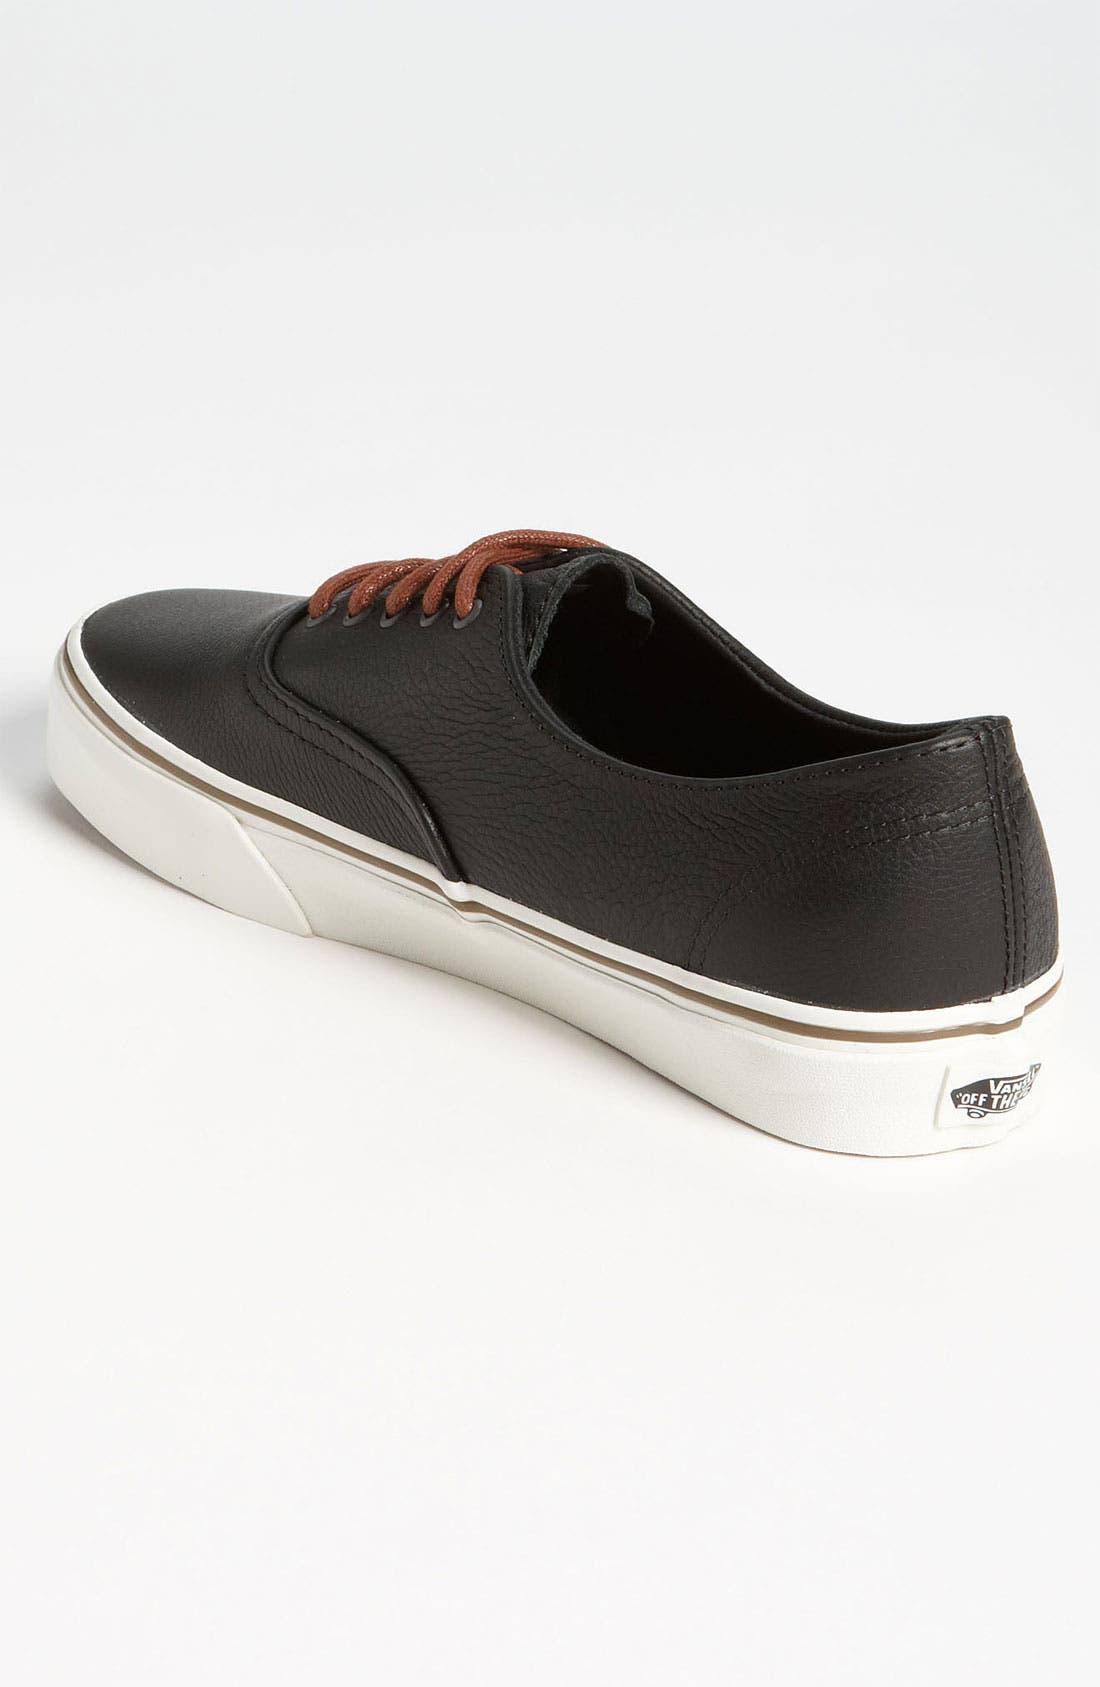 Alternate Image 2  - Vans 'Cali - Authentic Decon' Leather Sneaker (Men)